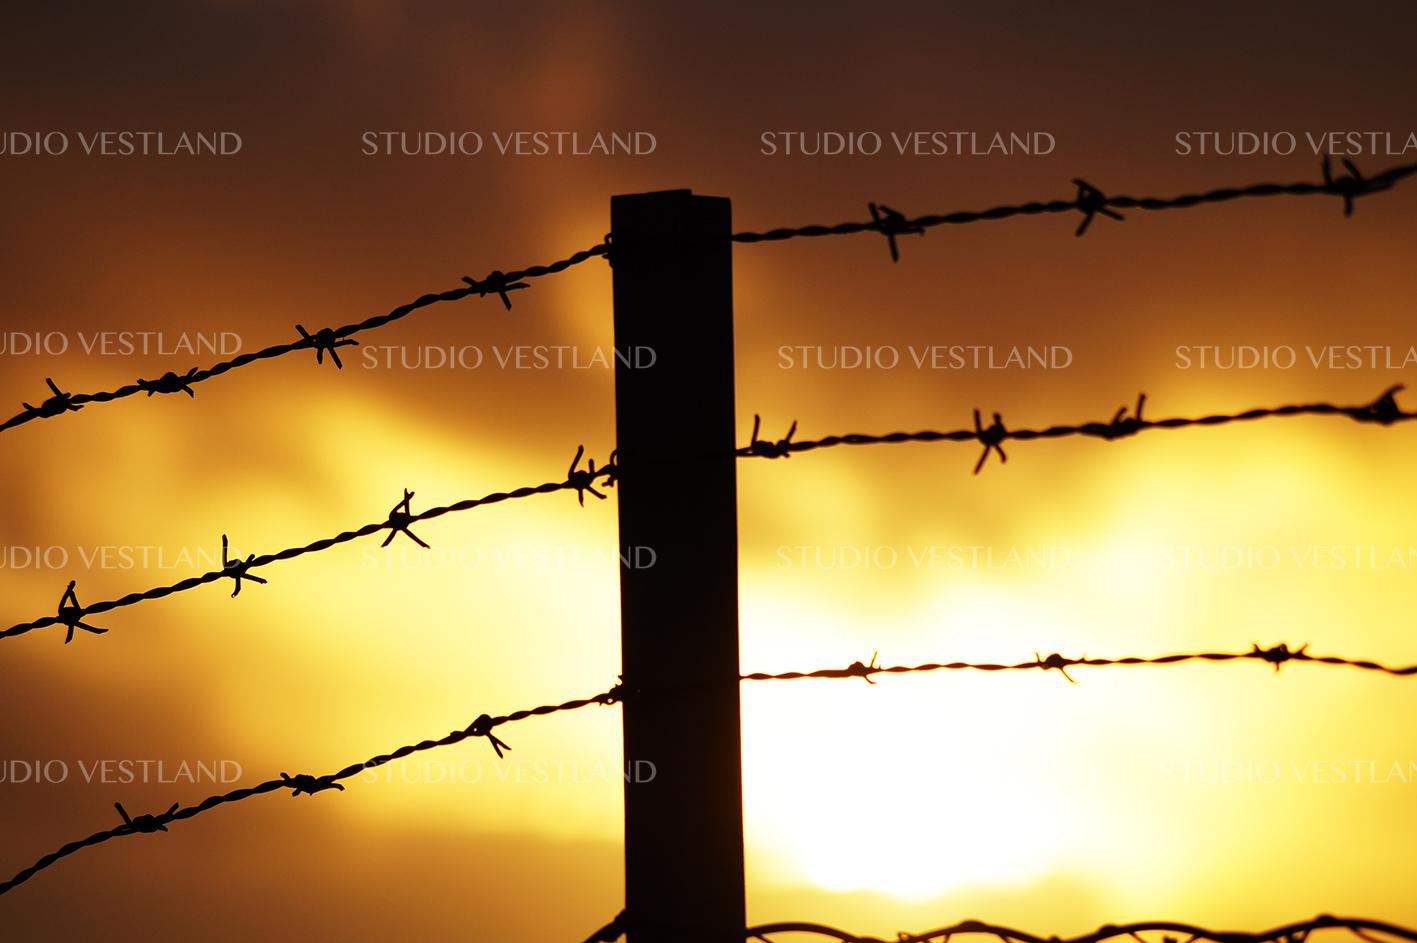 Studio Vestland - Gjerde 03